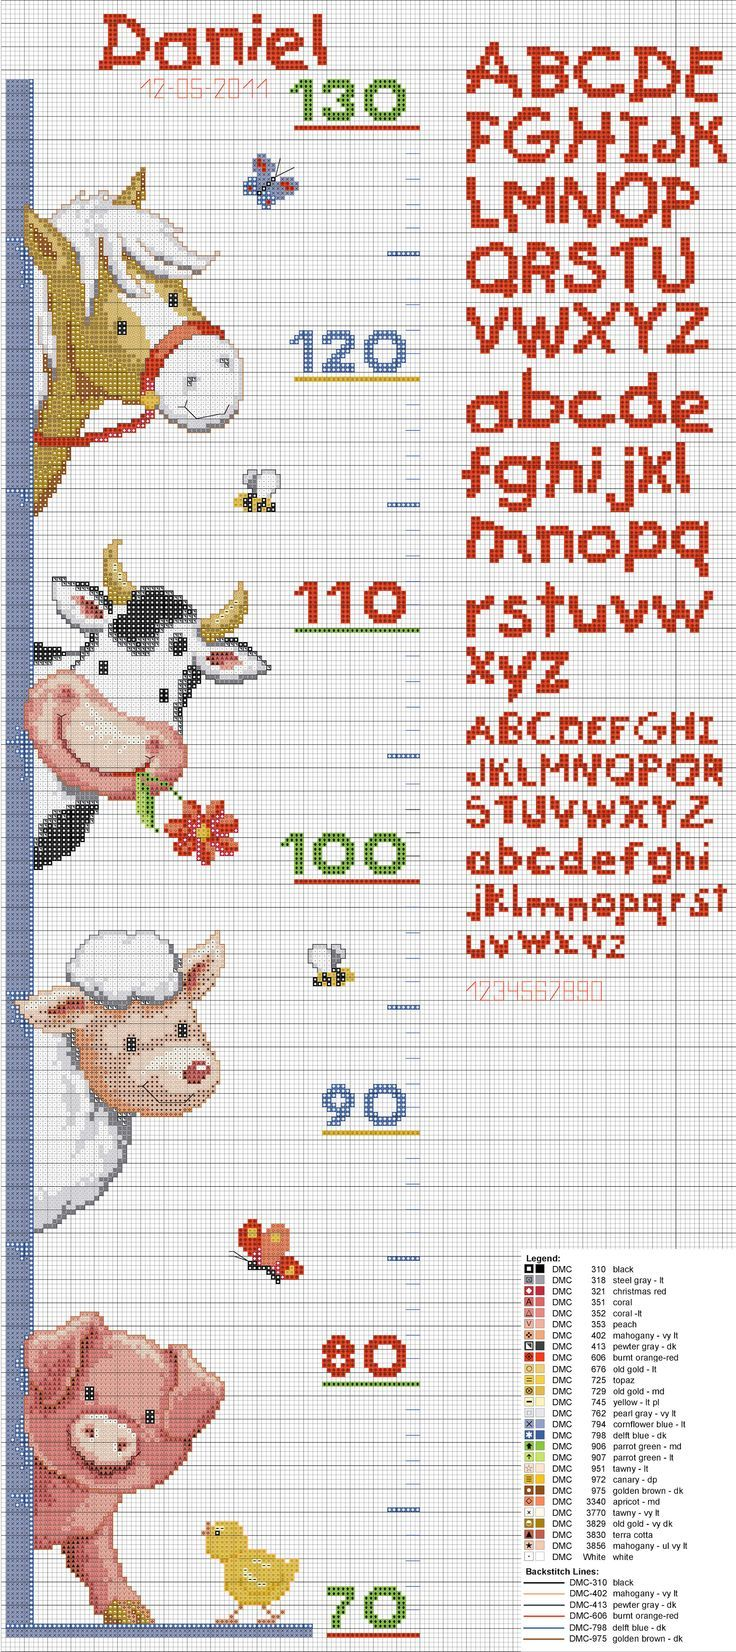 1d233dc8fb6a0cba135f3ef4a6dfac1b.jpg (736×1652)